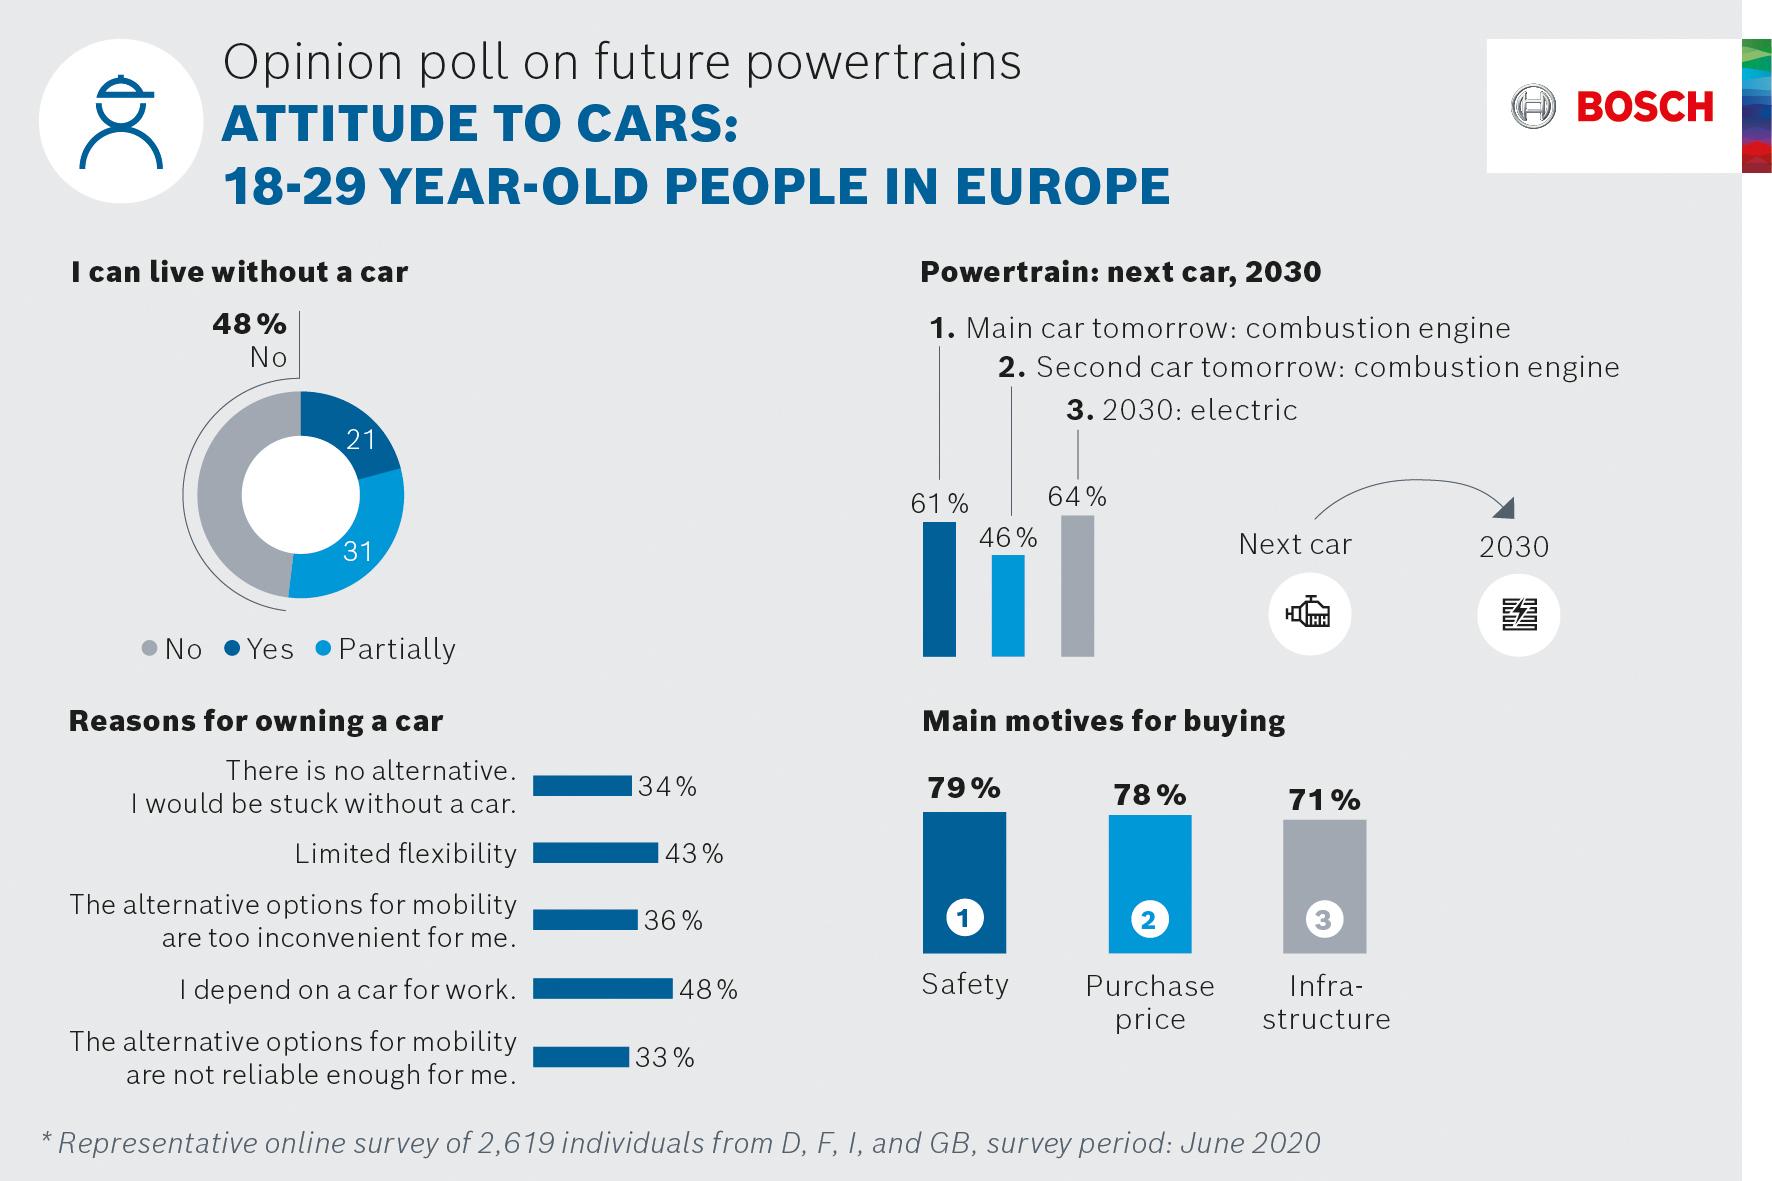 Opinion poll on future powertrains